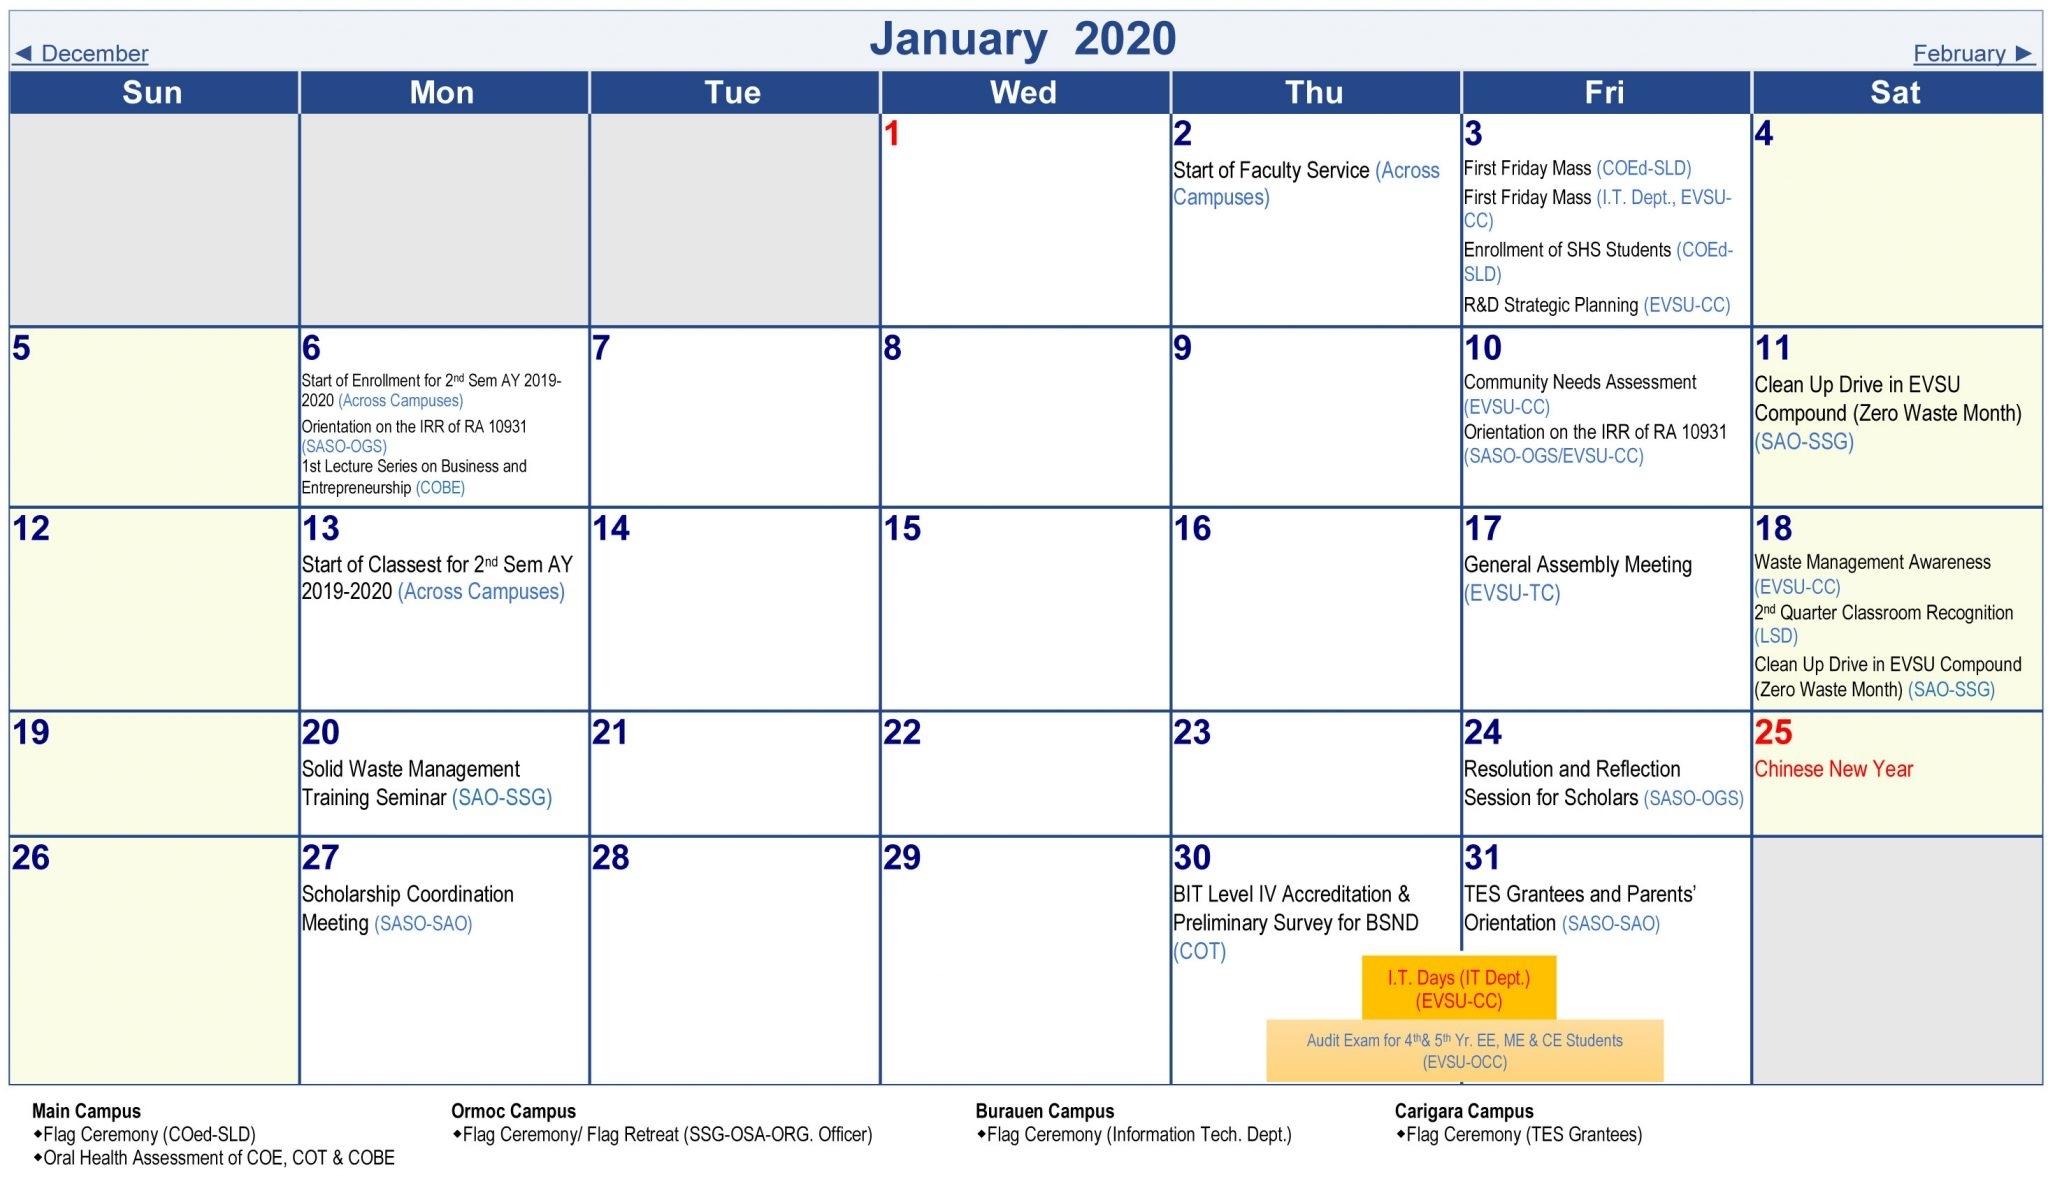 University Academic Calendar (A.y. 2019-2020)-January 2020 Regents Calendar